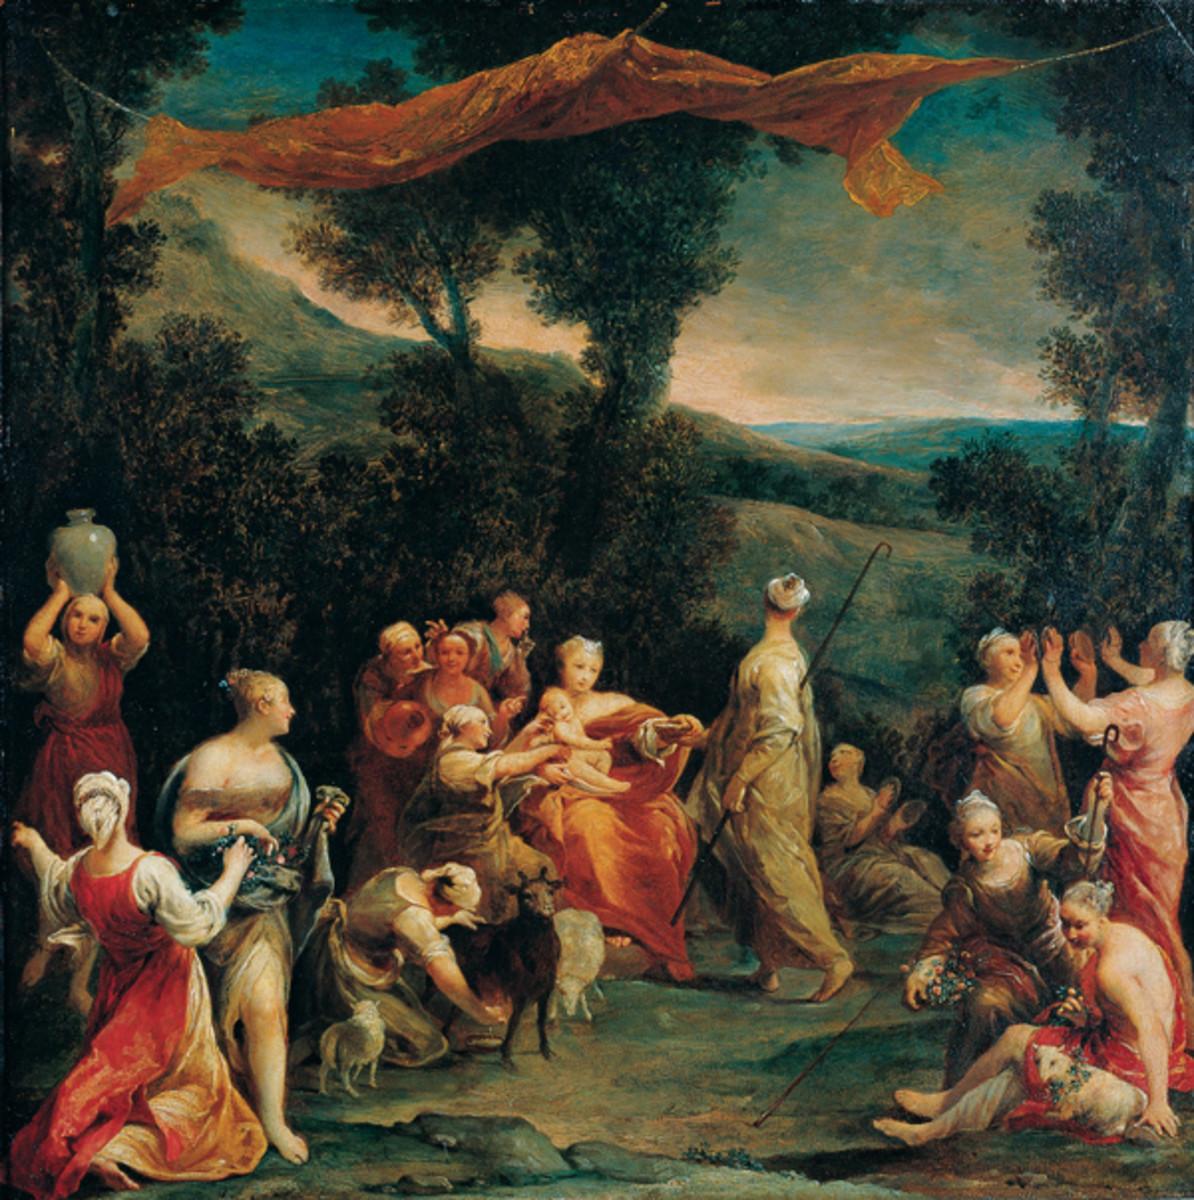 'Jupiter Among the Corybantes (Korybantes)', oil on copper painting by Giuseppe Maria Crespi PD-art-100